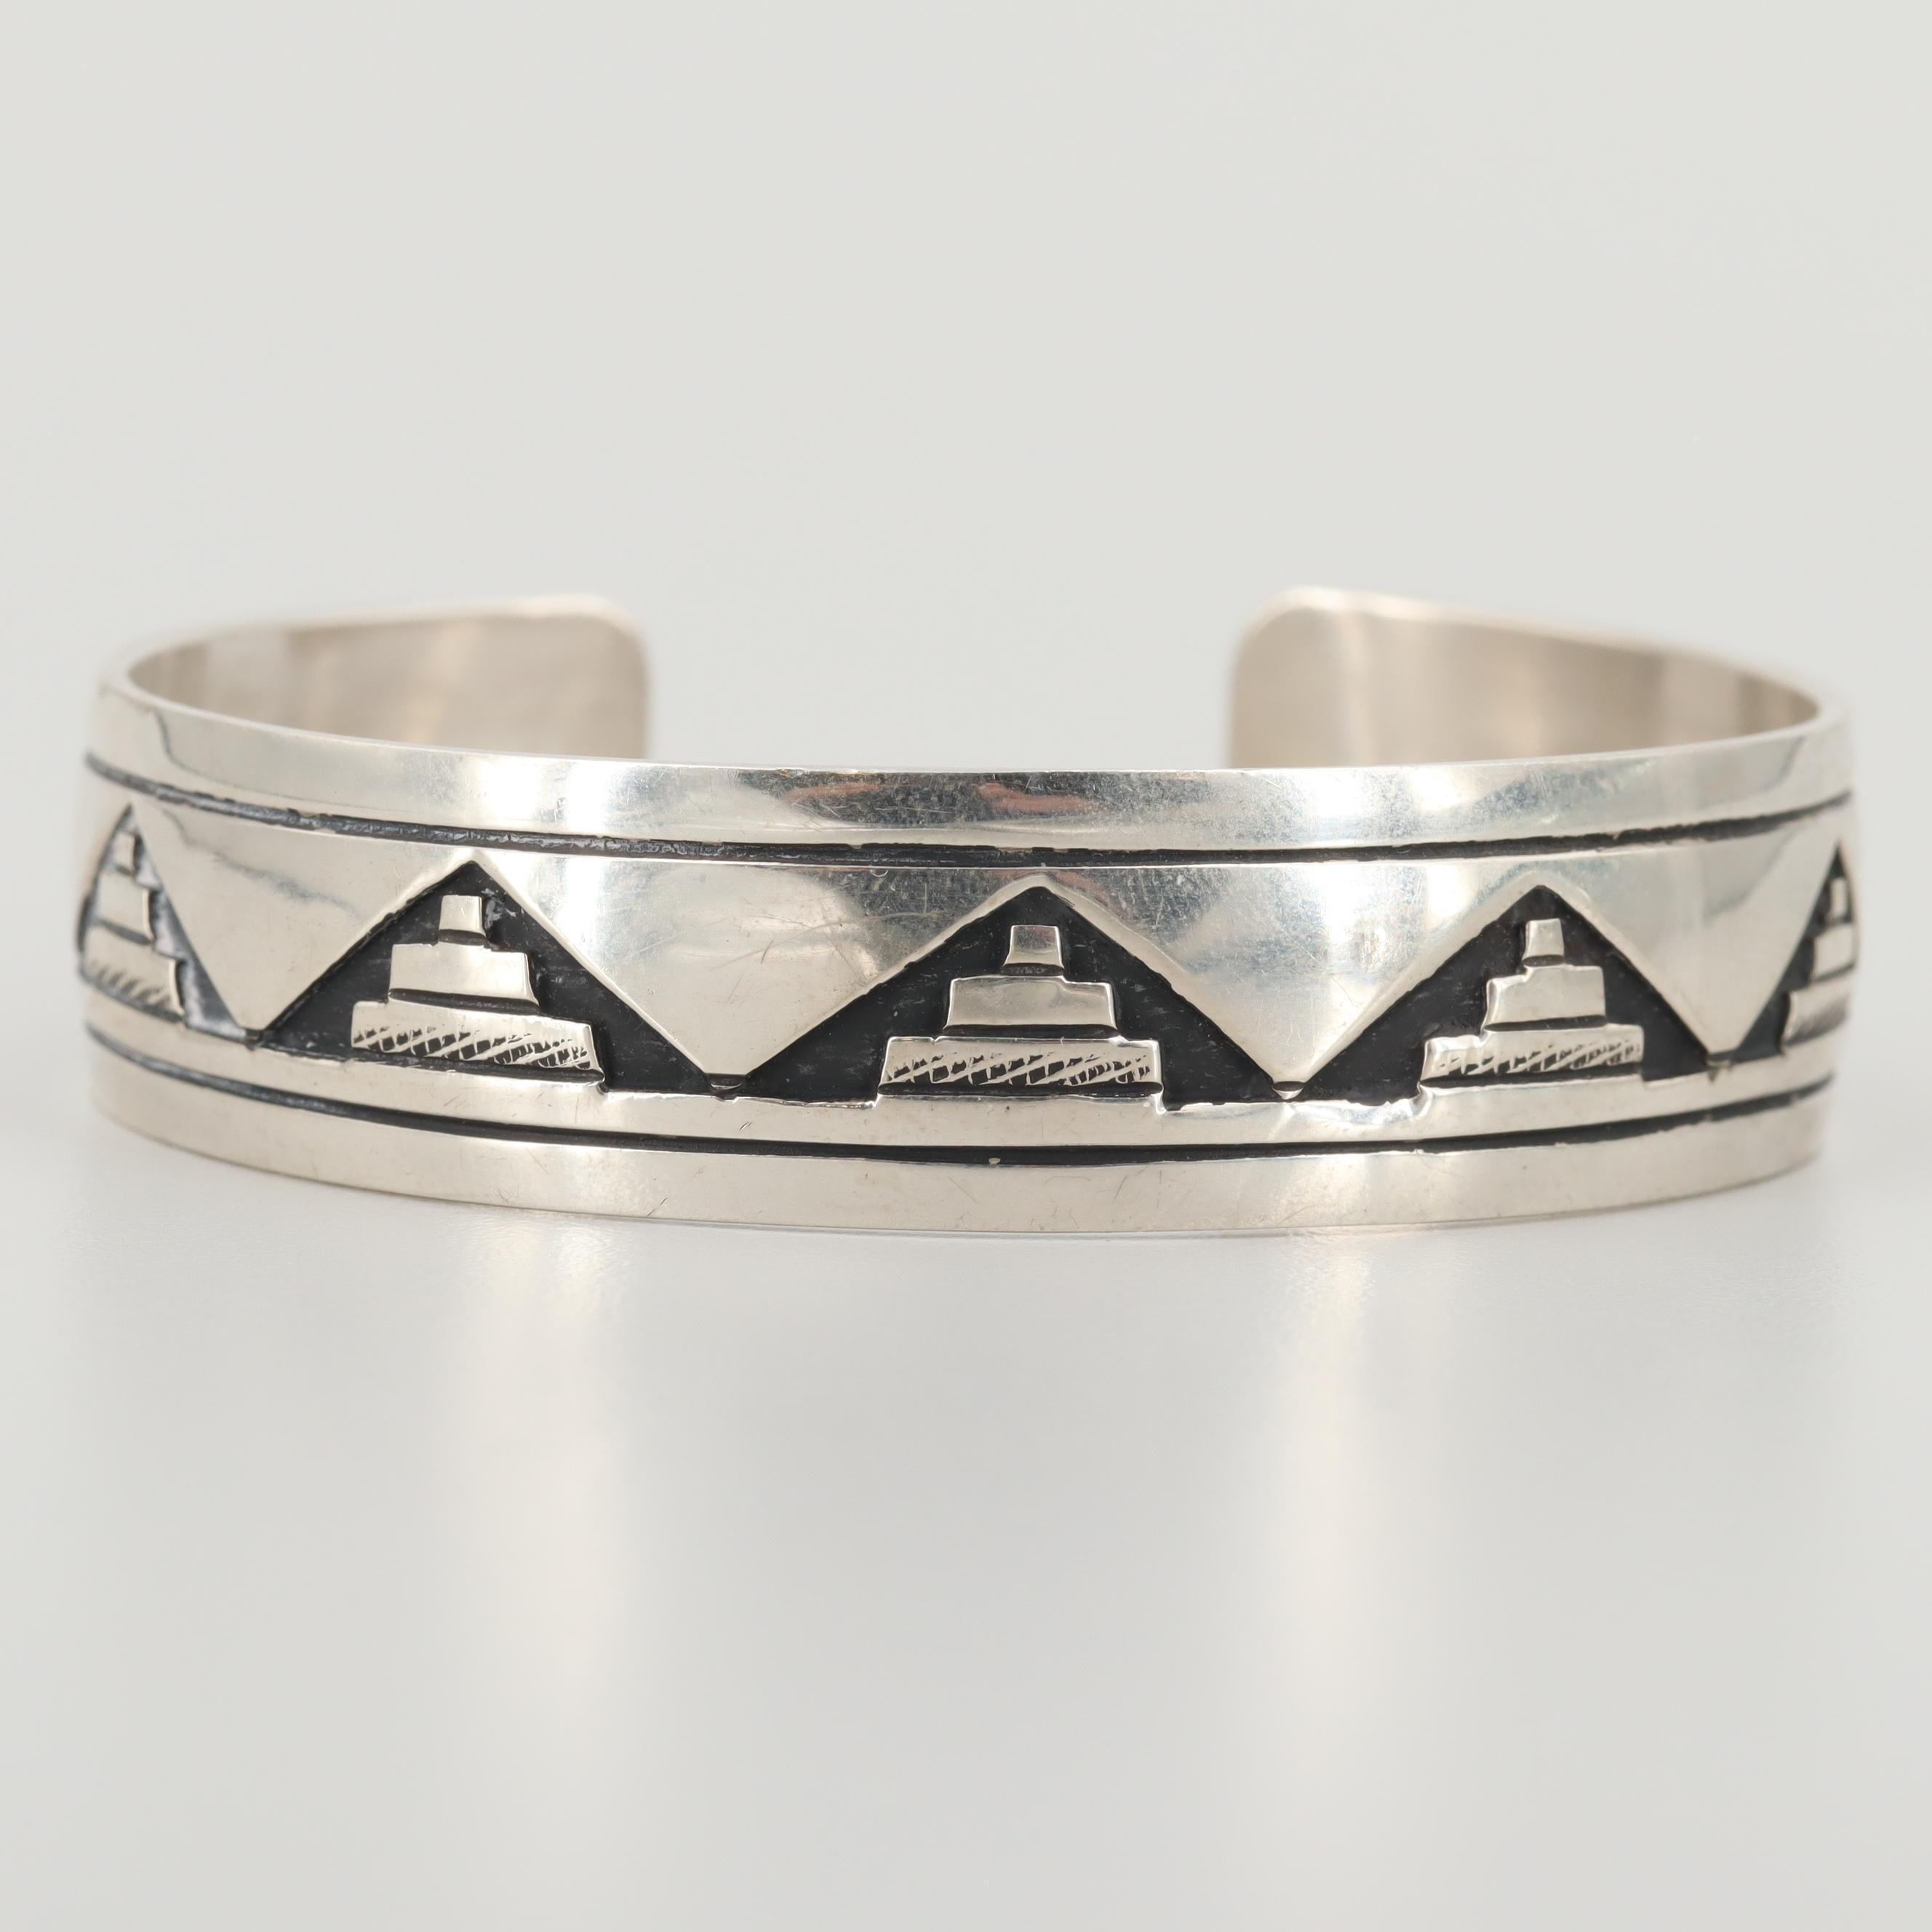 Tom Billy Navajo Diné Sterling Silver Cuff Bracelet